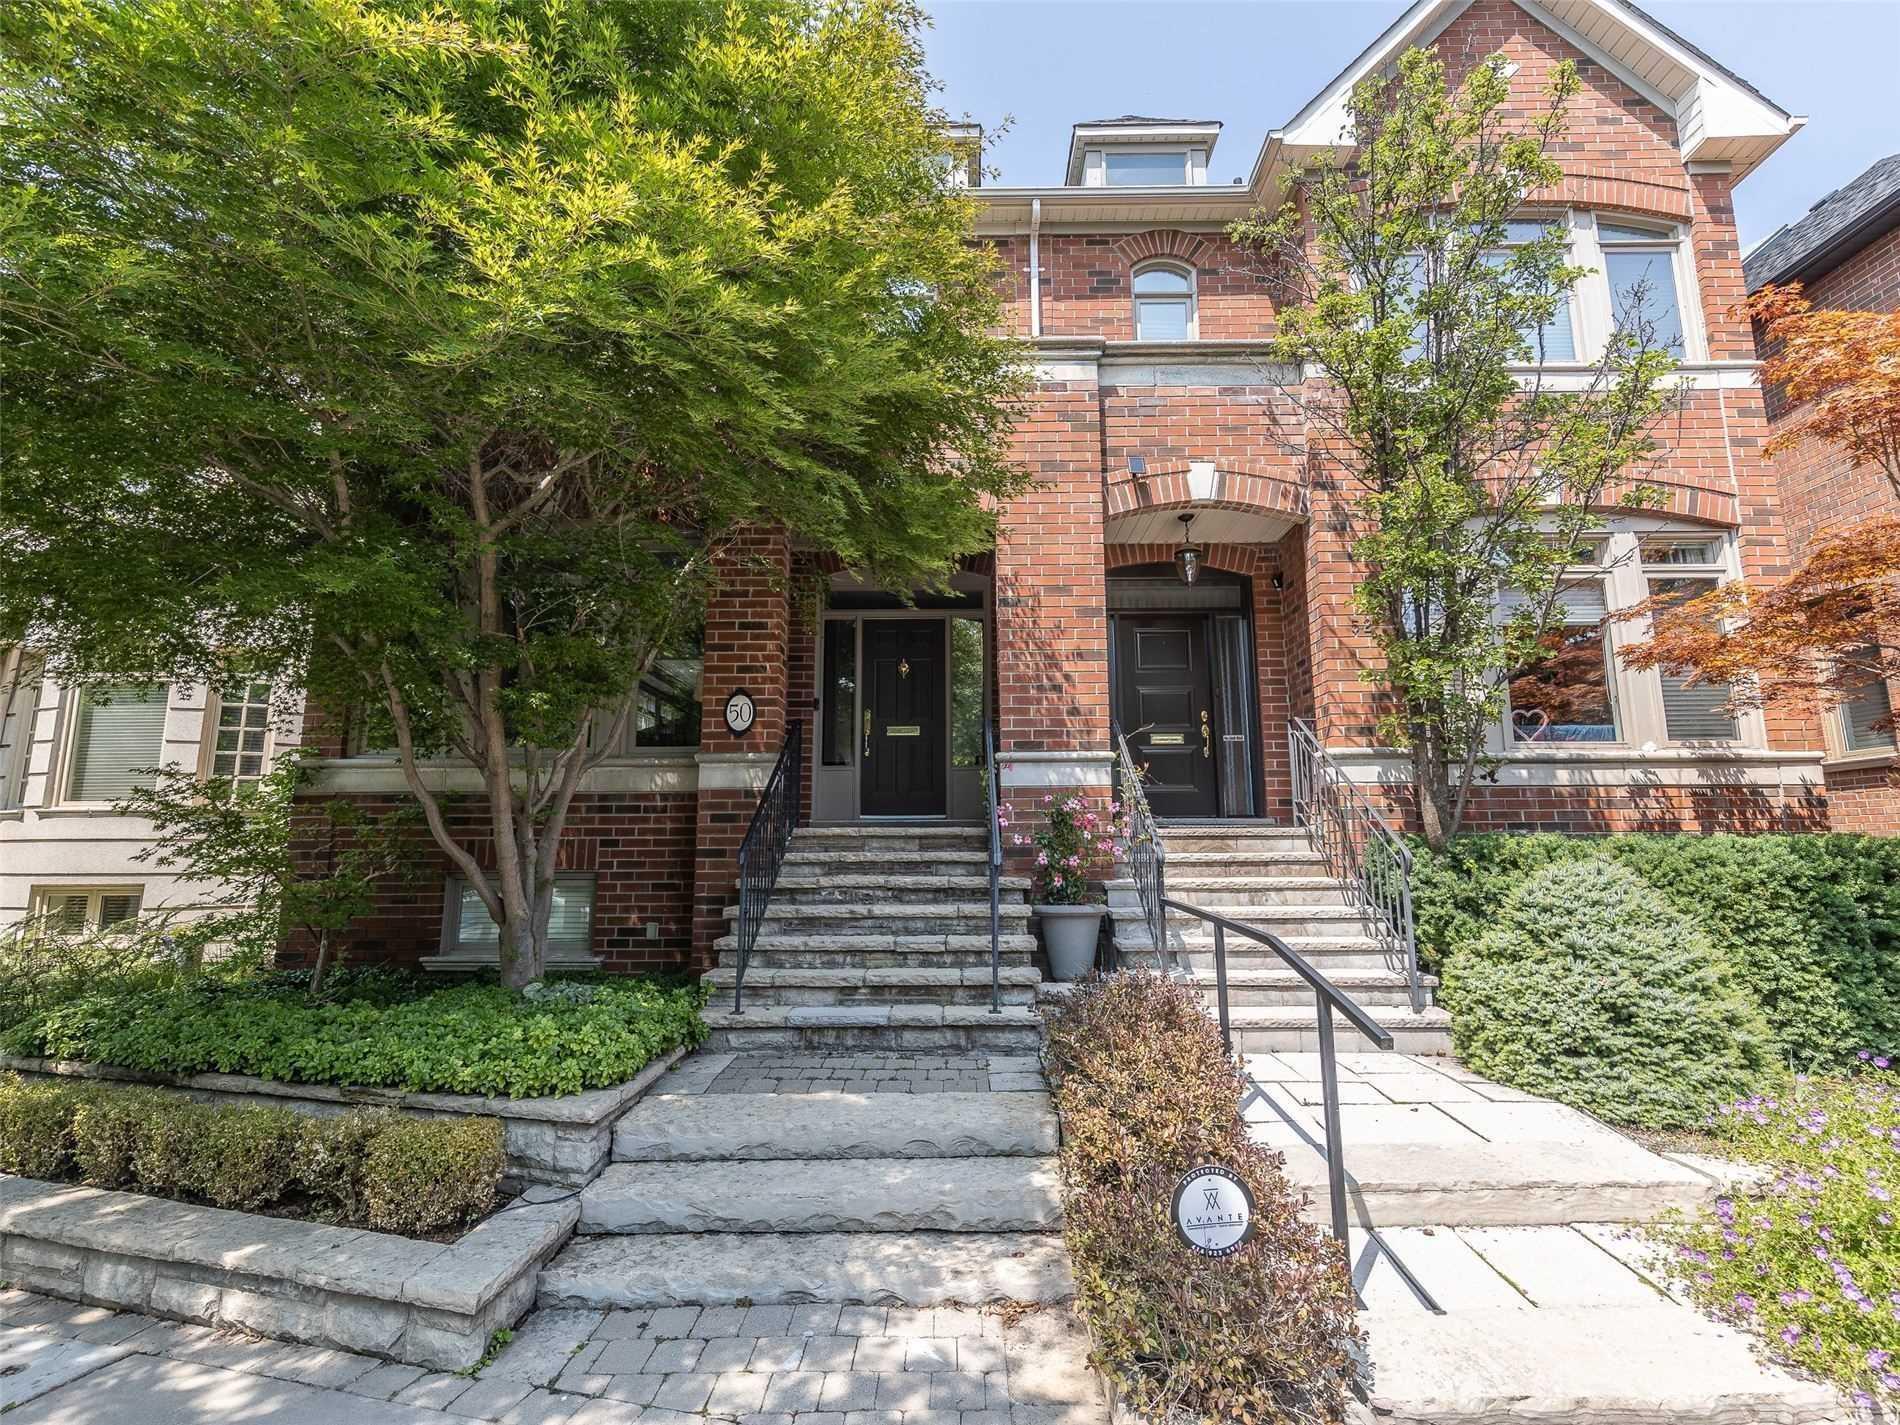 50 Mathersfield Dr, Toronto, M4W3W5